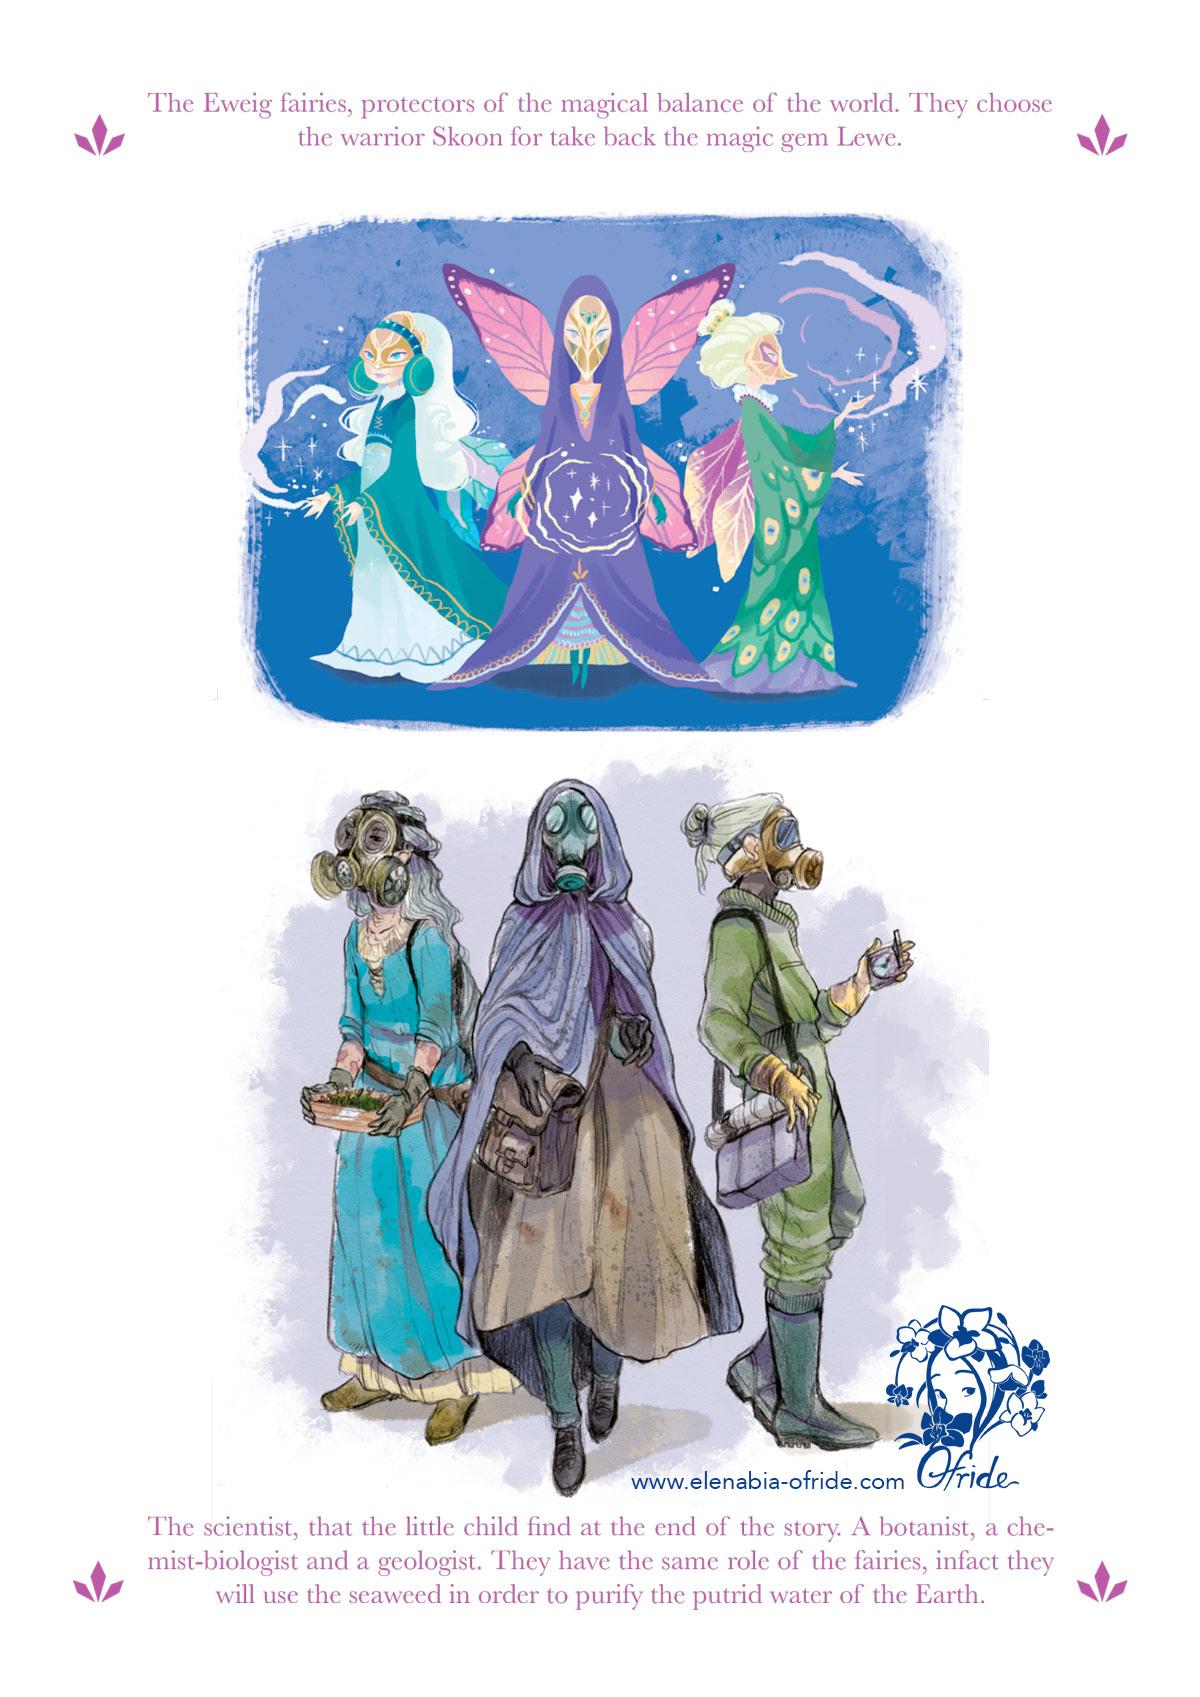 lewe characters studies fayries and scientists